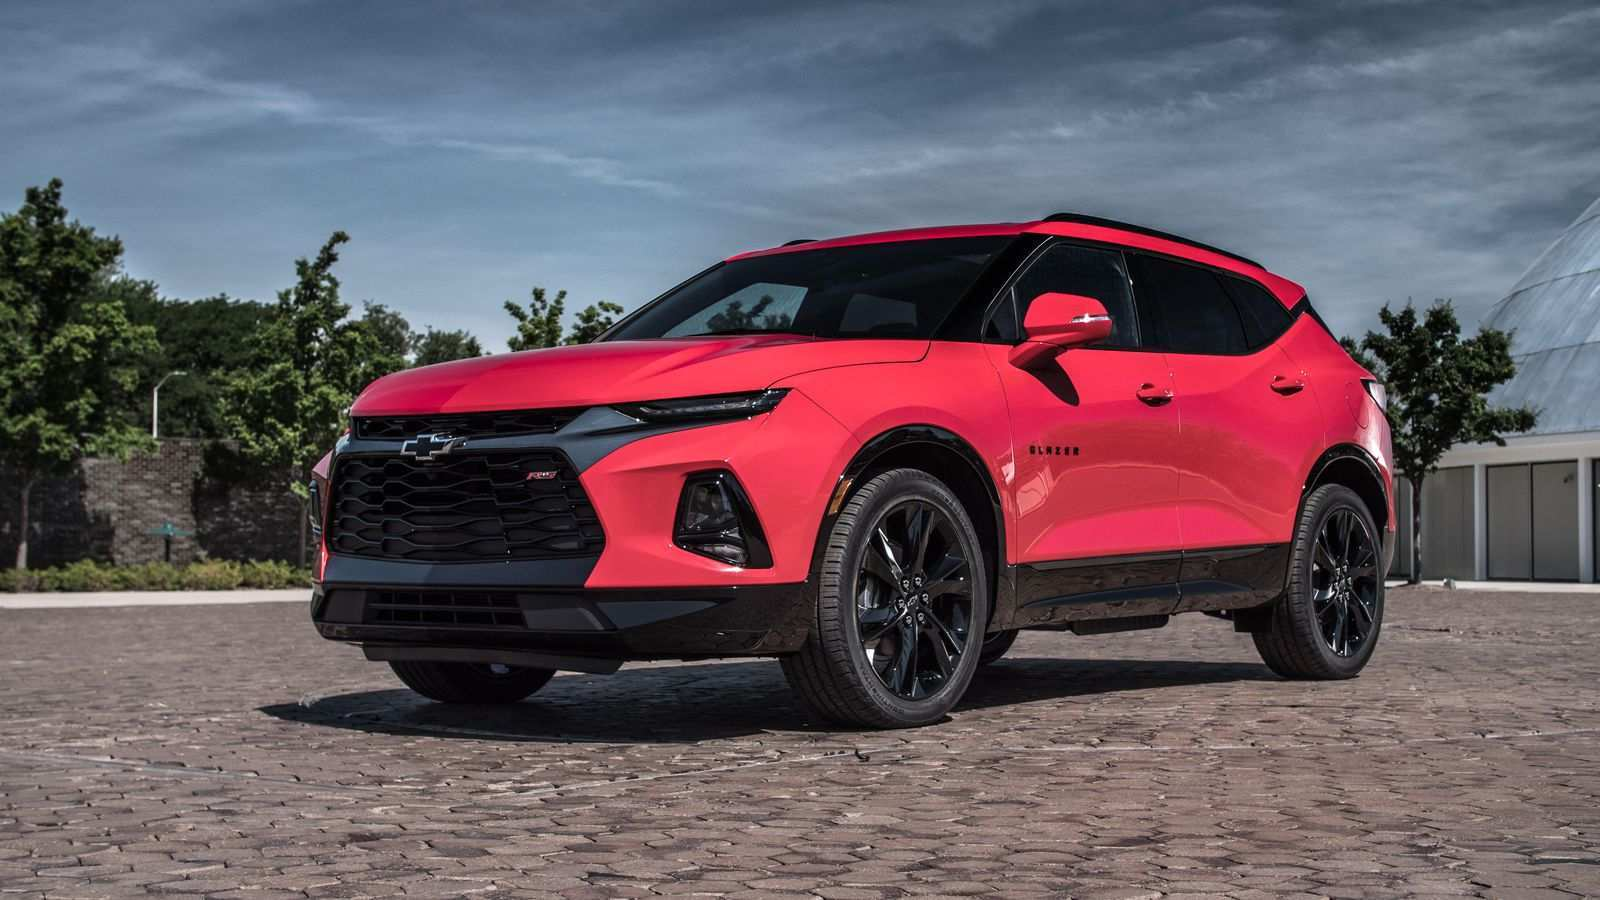 90 New New New Chevrolet 2019 Blazer Engine Spesification by New New Chevrolet 2019 Blazer Engine